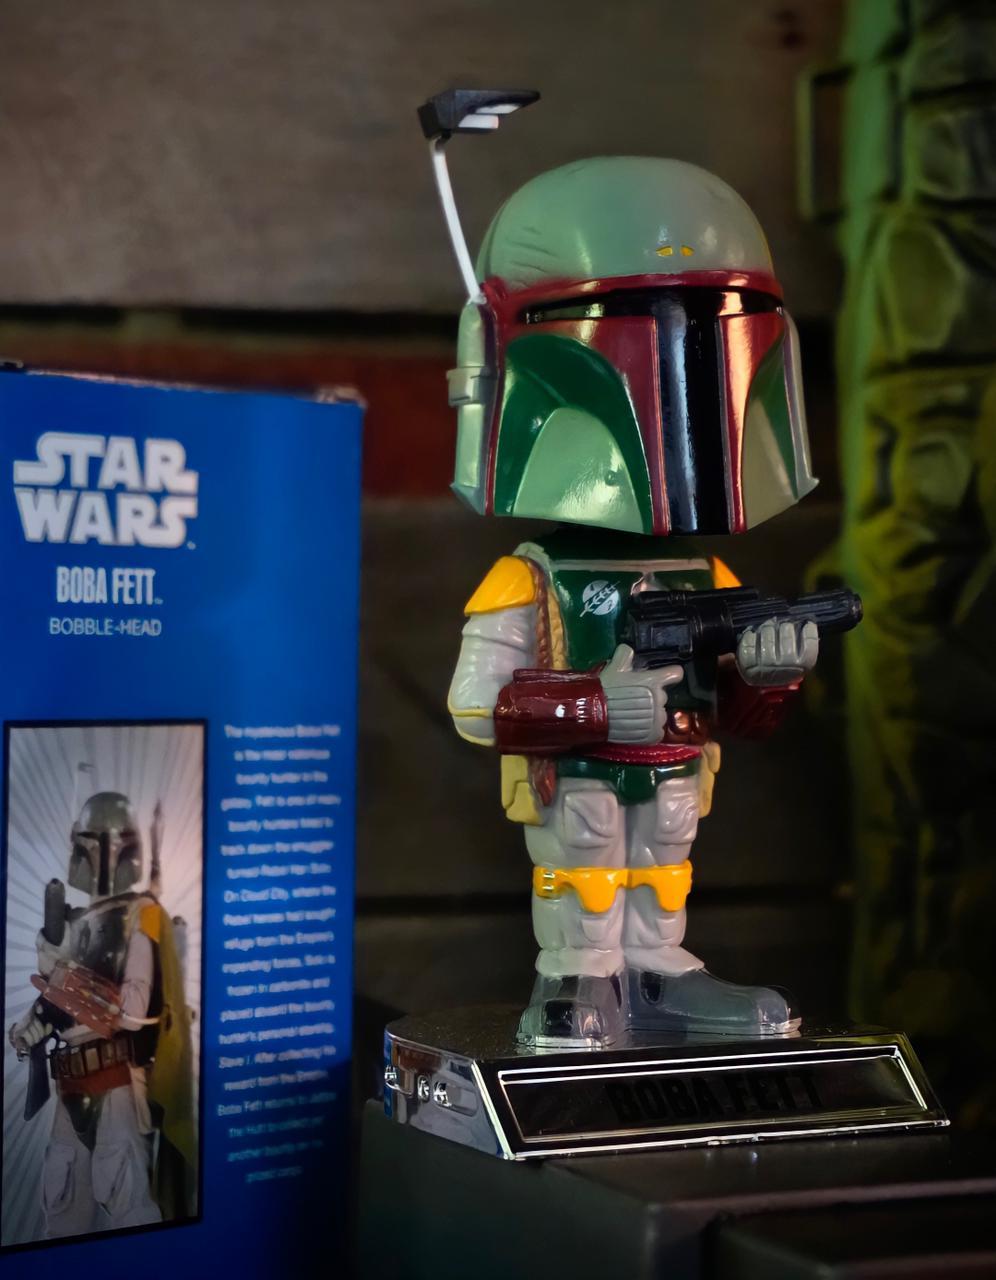 Estátua Wacky Wobbler Boba Fett: Star Wars Bobble-Head - Funko